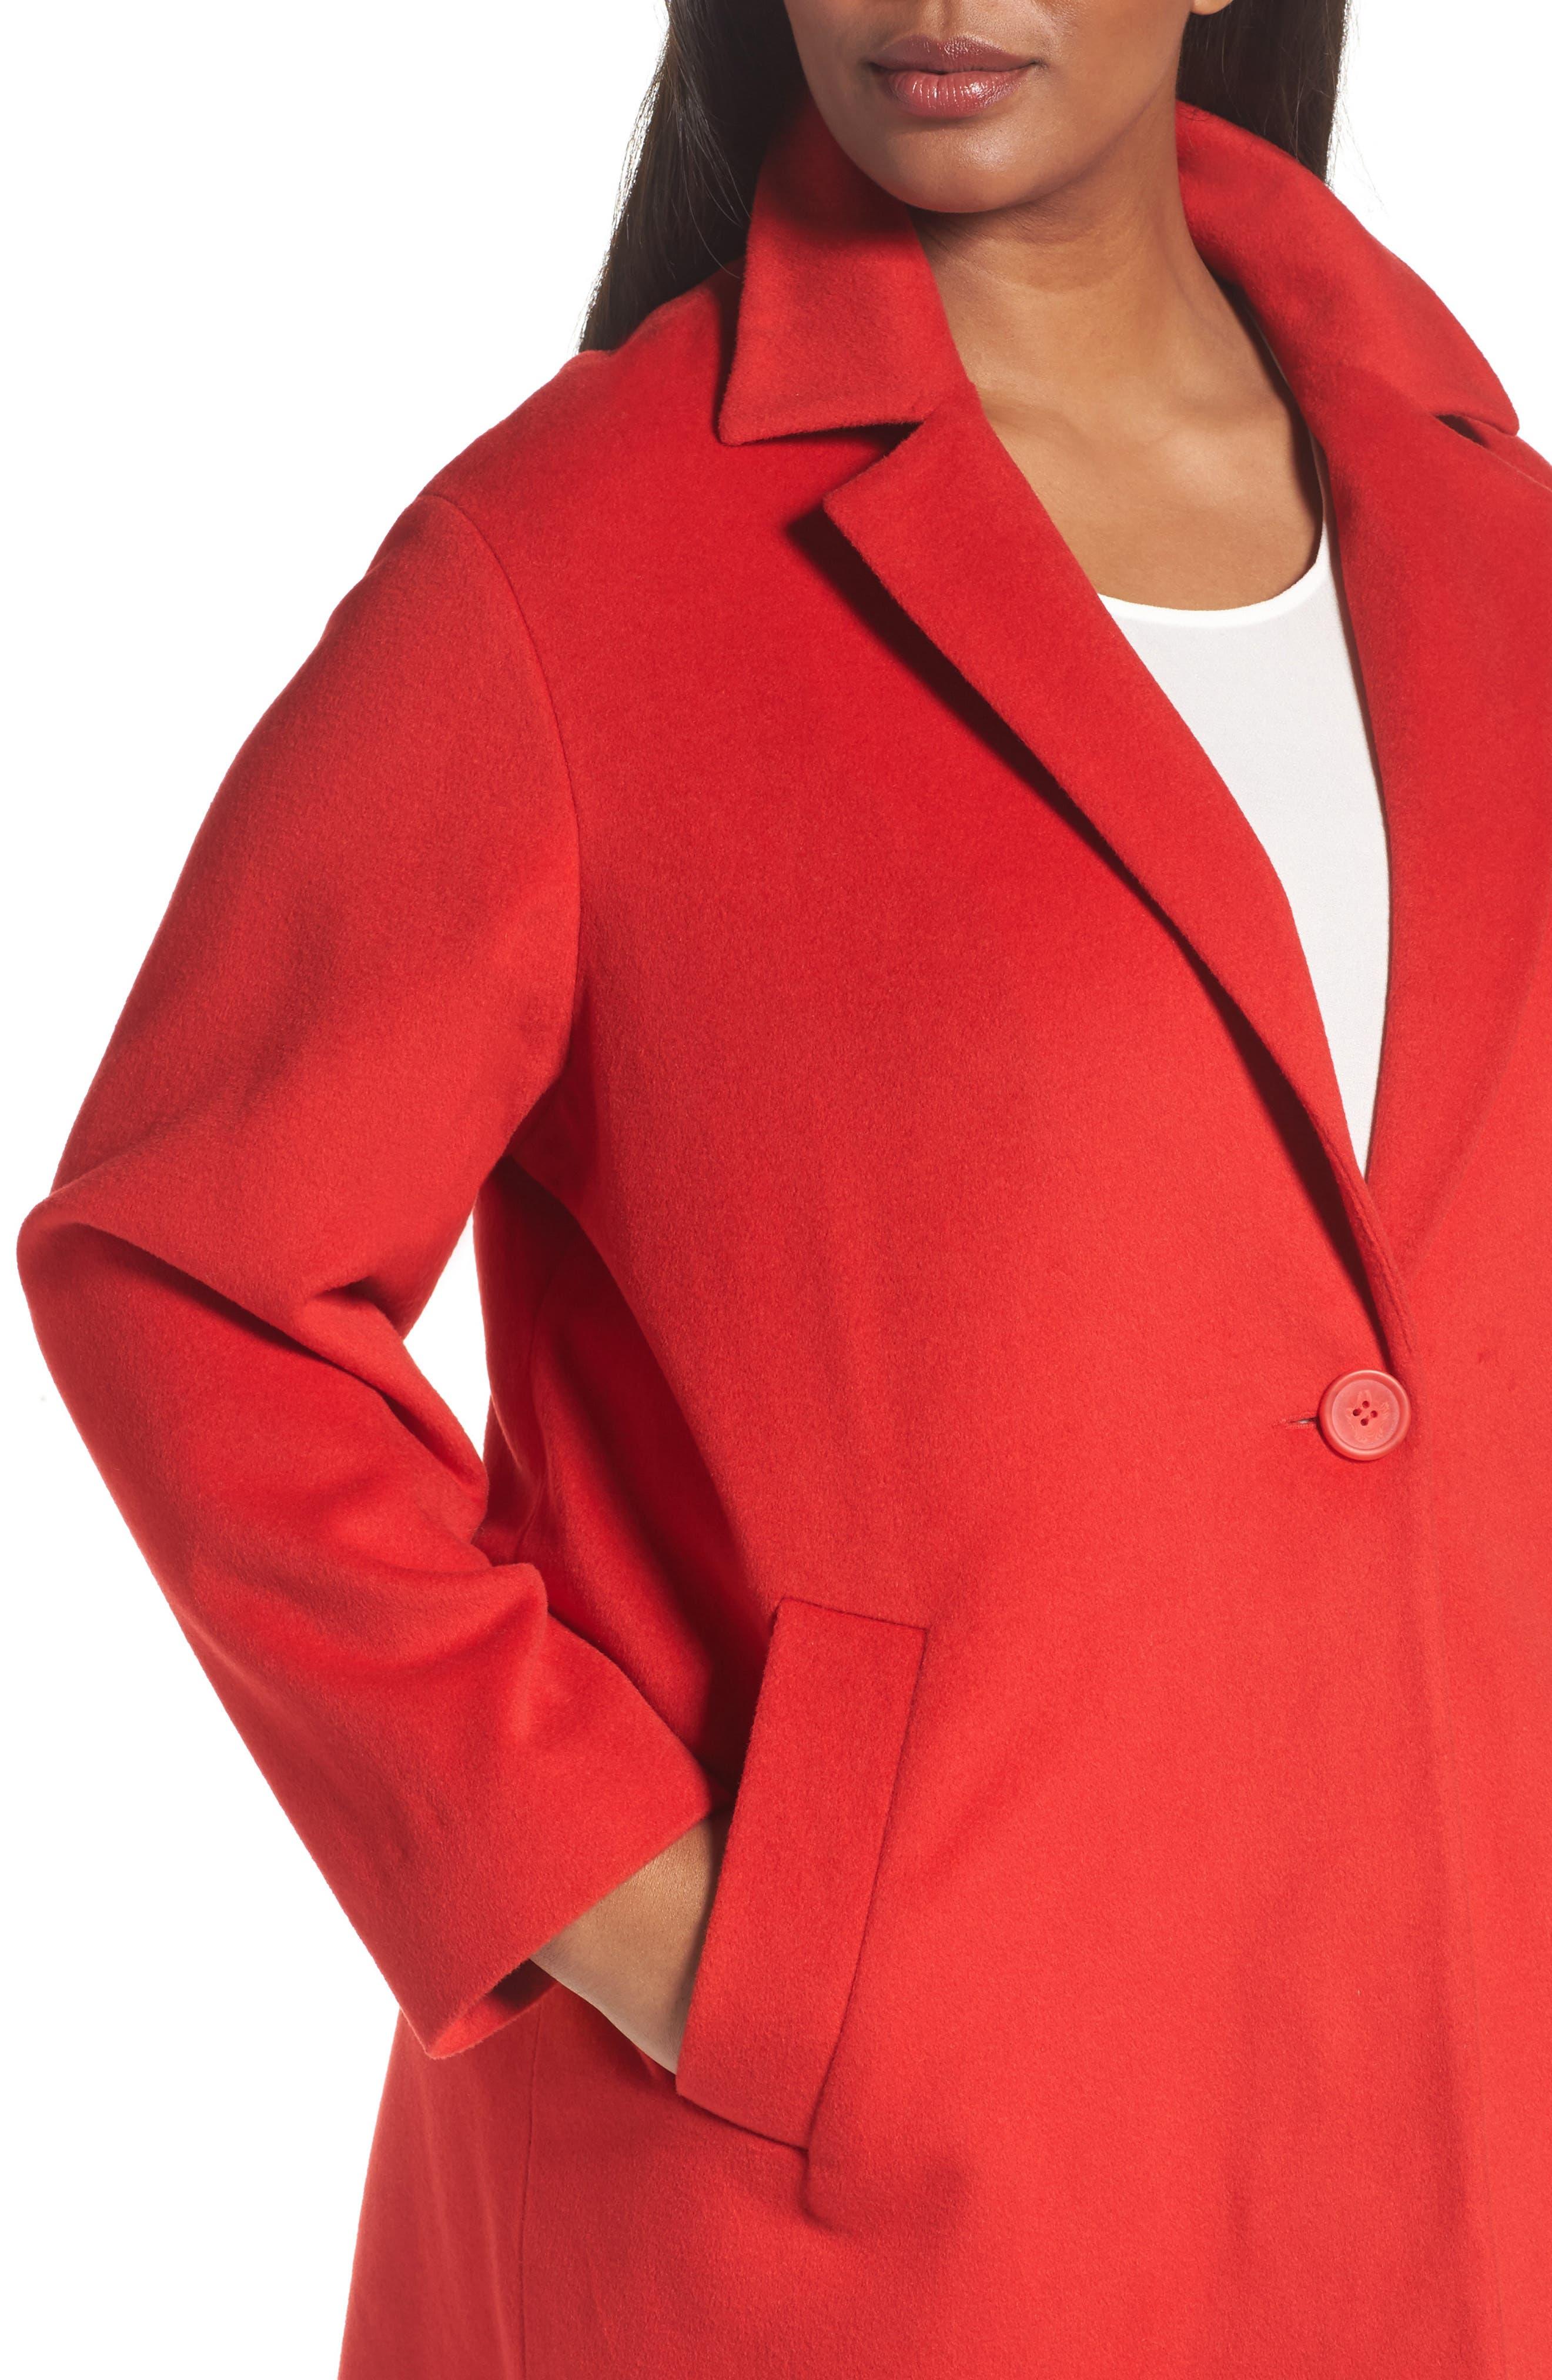 Wool Blend Coat,                             Alternate thumbnail 4, color,                             Red